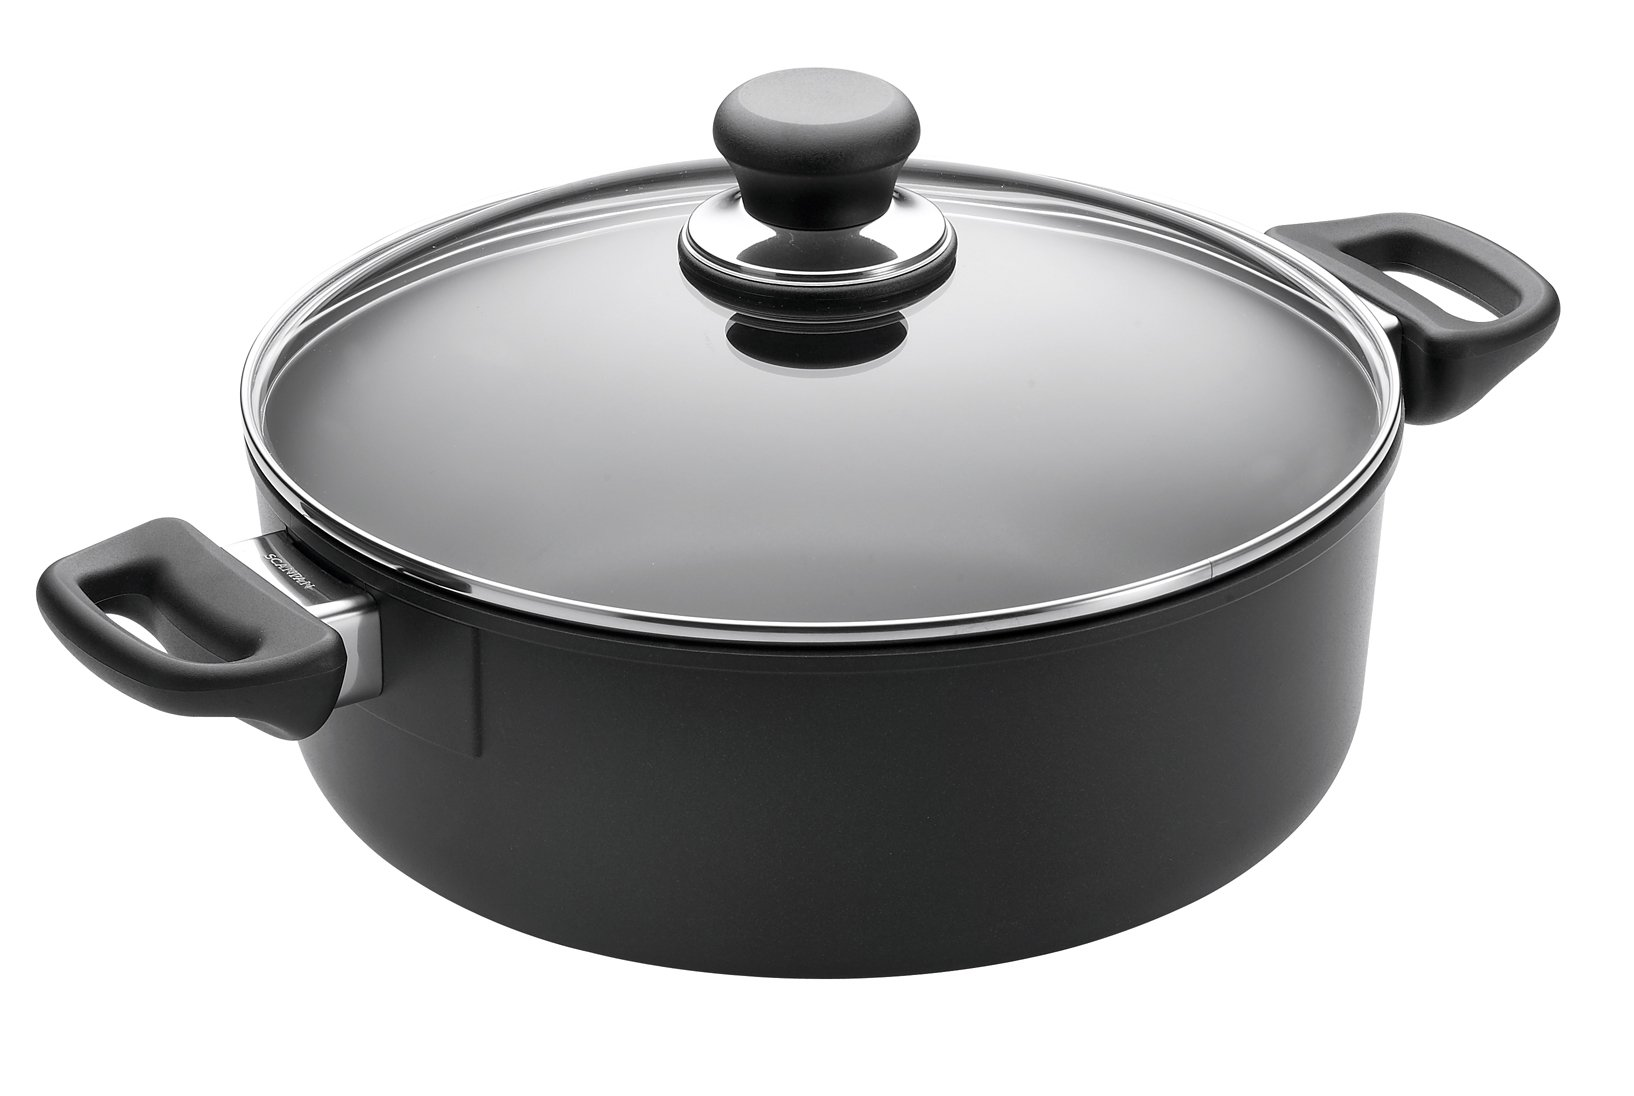 Scanpan Classic 5-Quart Covered Low Sauce Pot